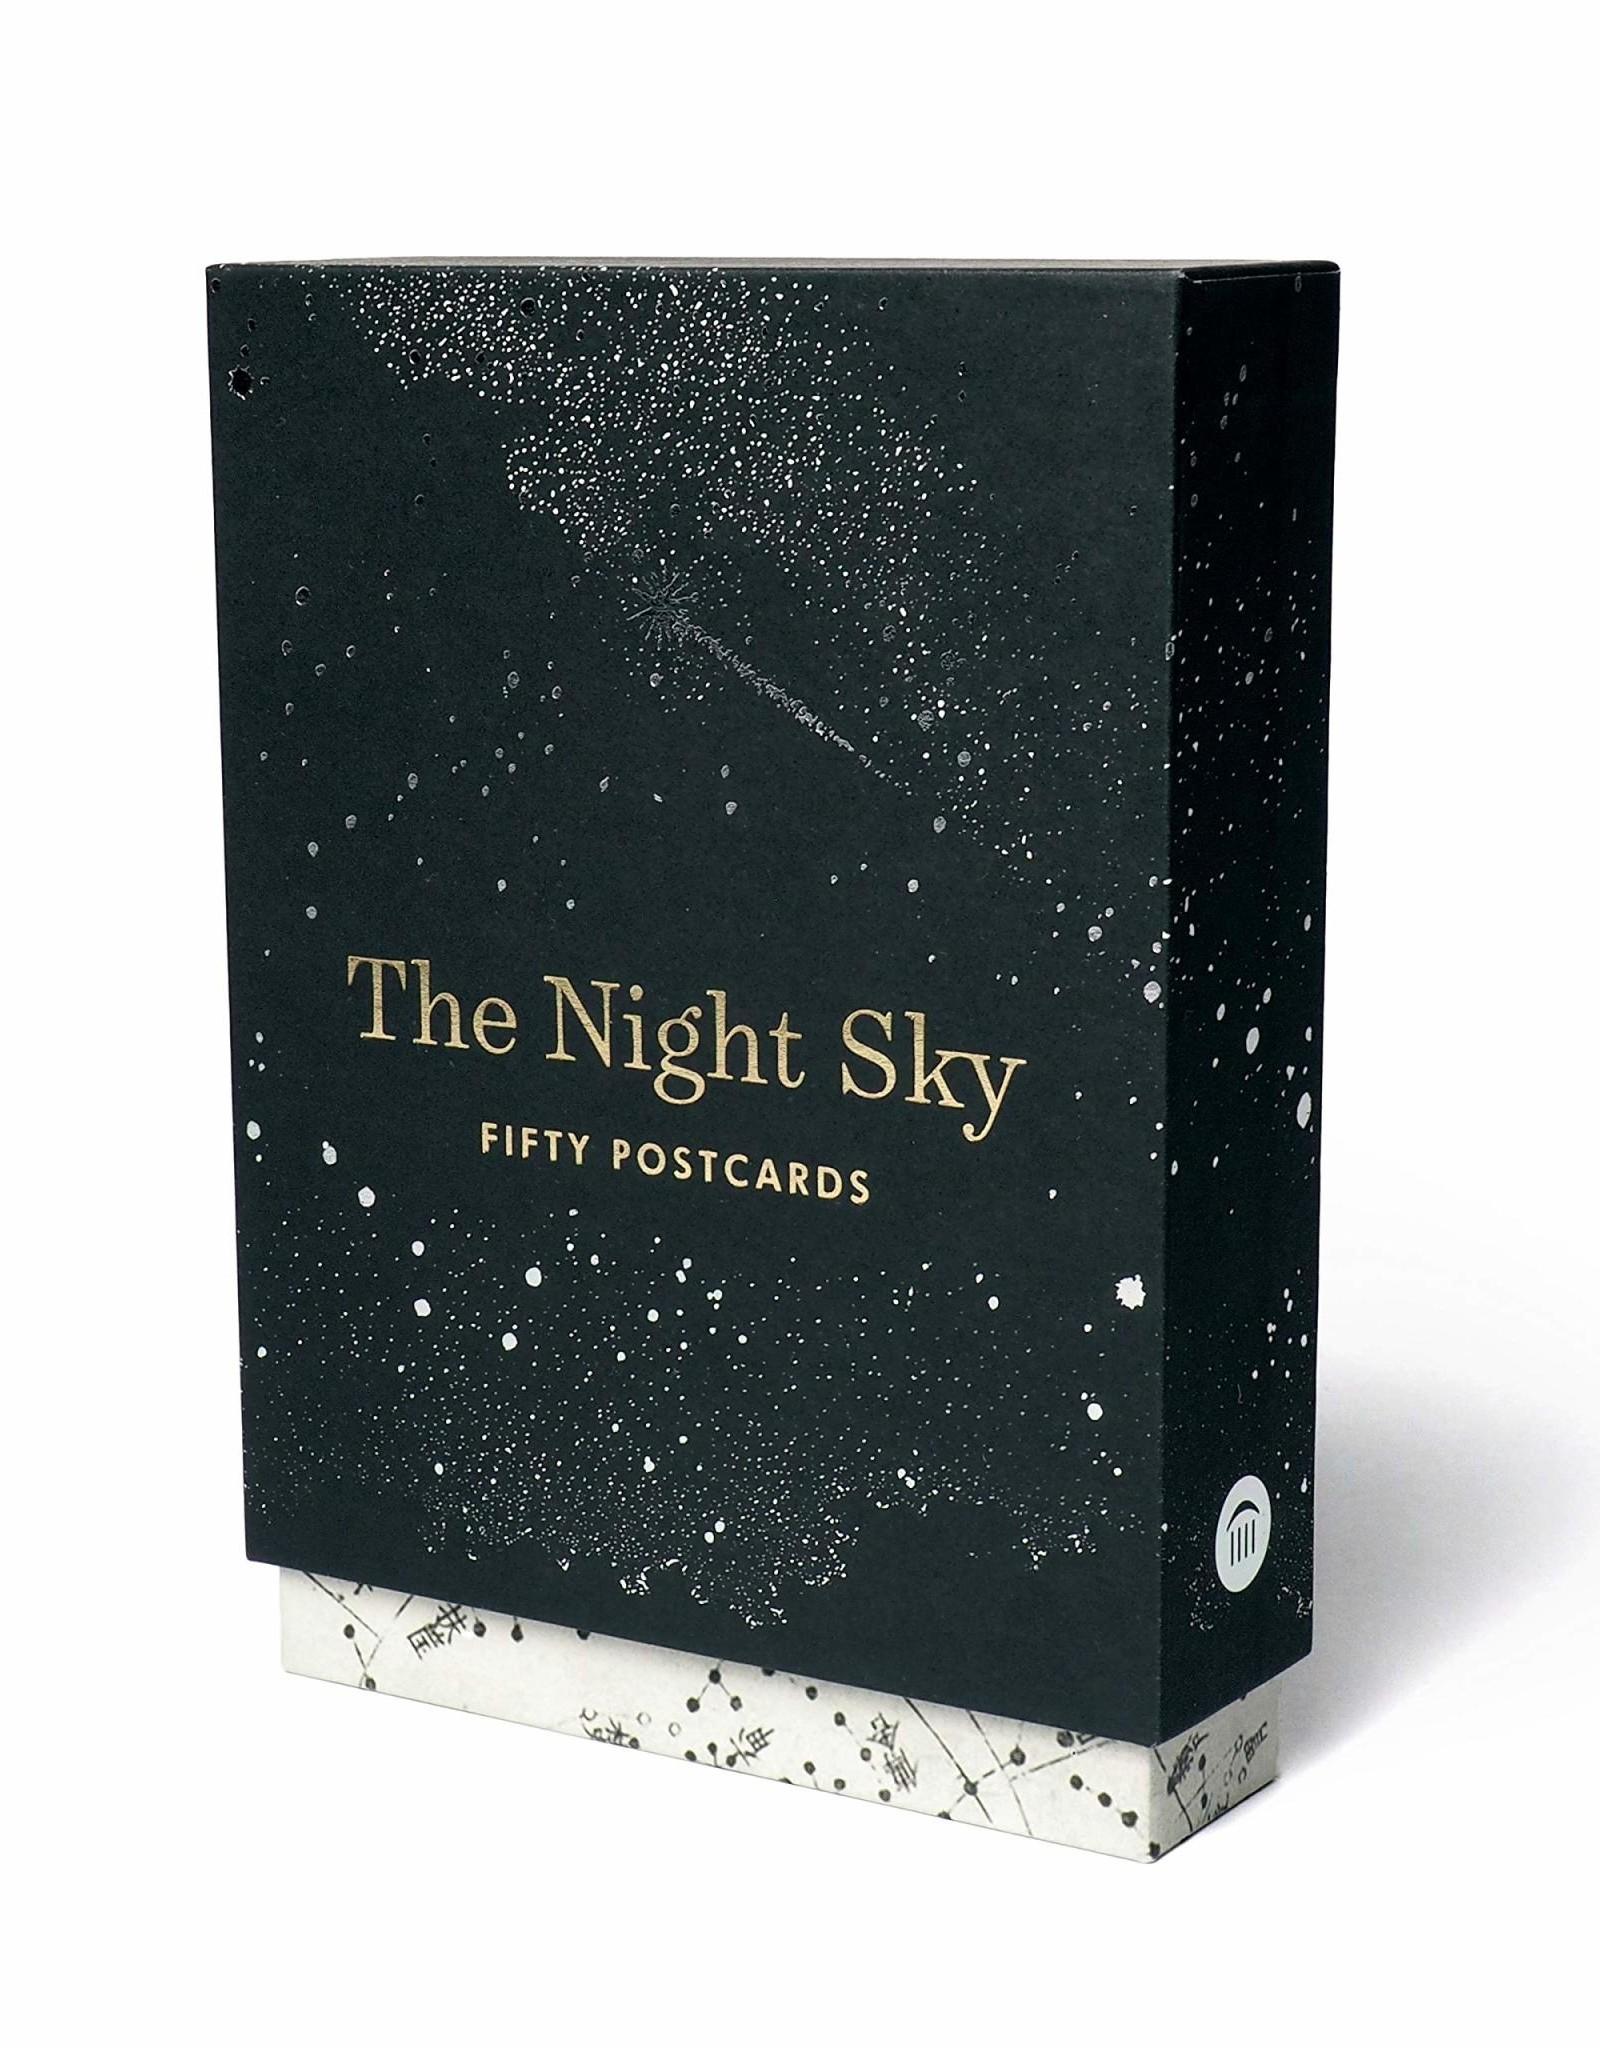 The Night Sky 50 Postcards